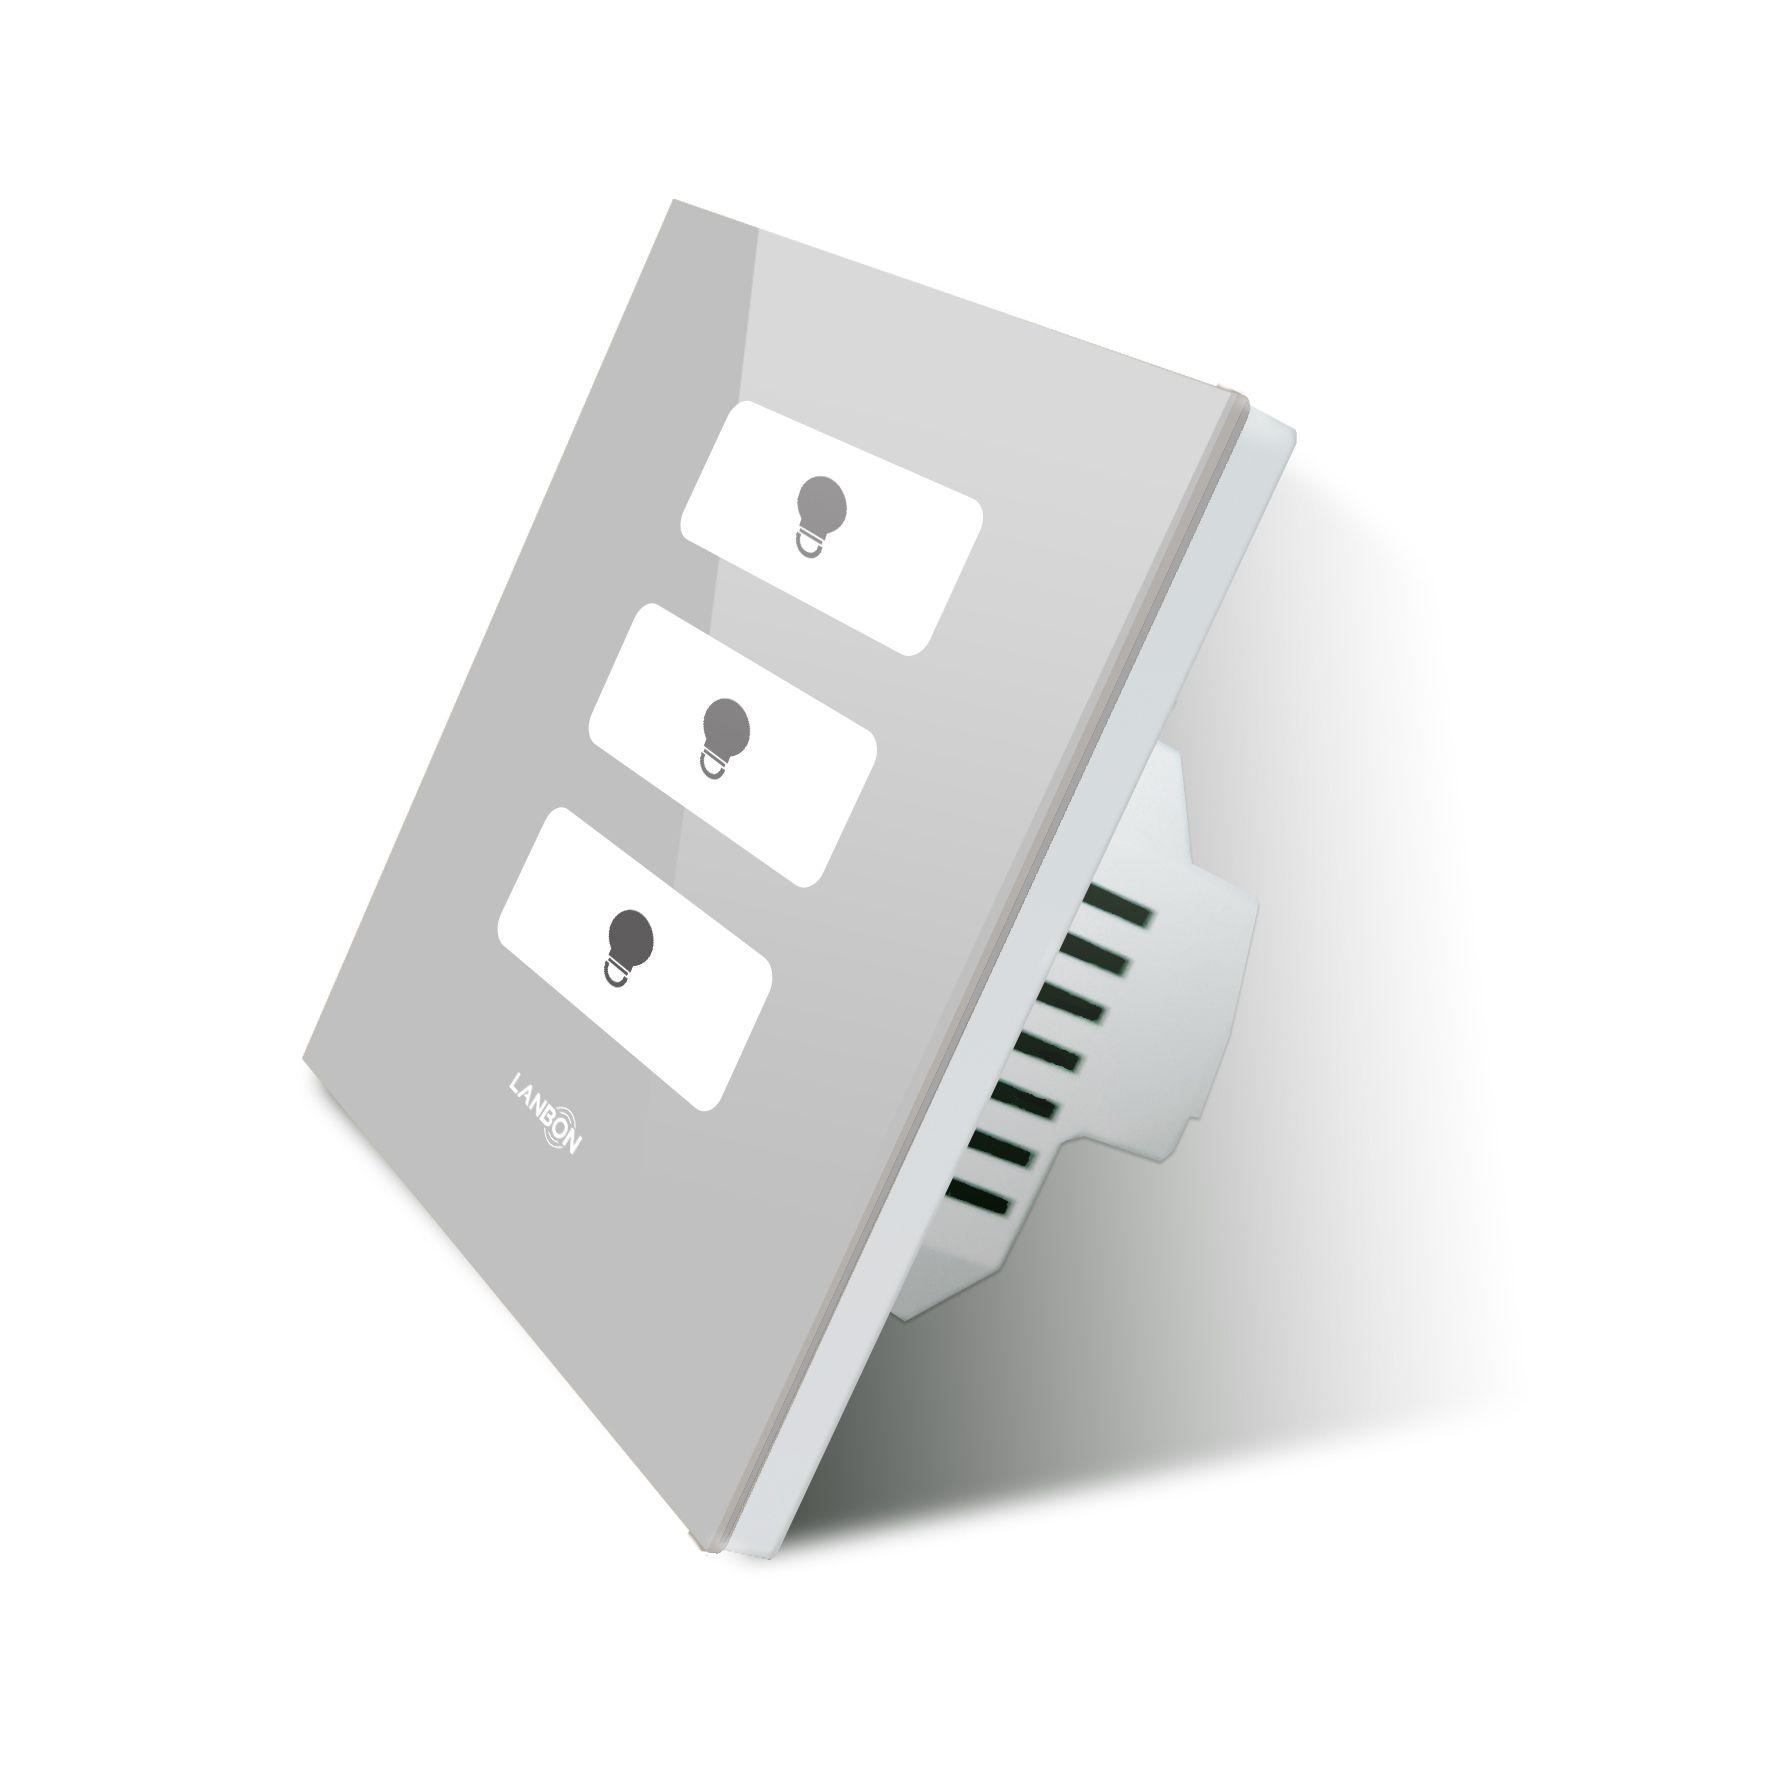 Lanbon Wireless Switch 3 Gang 2 Way 3 Way Wifi Remote Control Switch On Off Wall Light Switch Iot Google Home Voic Wireless Switch Smart Switches Voice Control